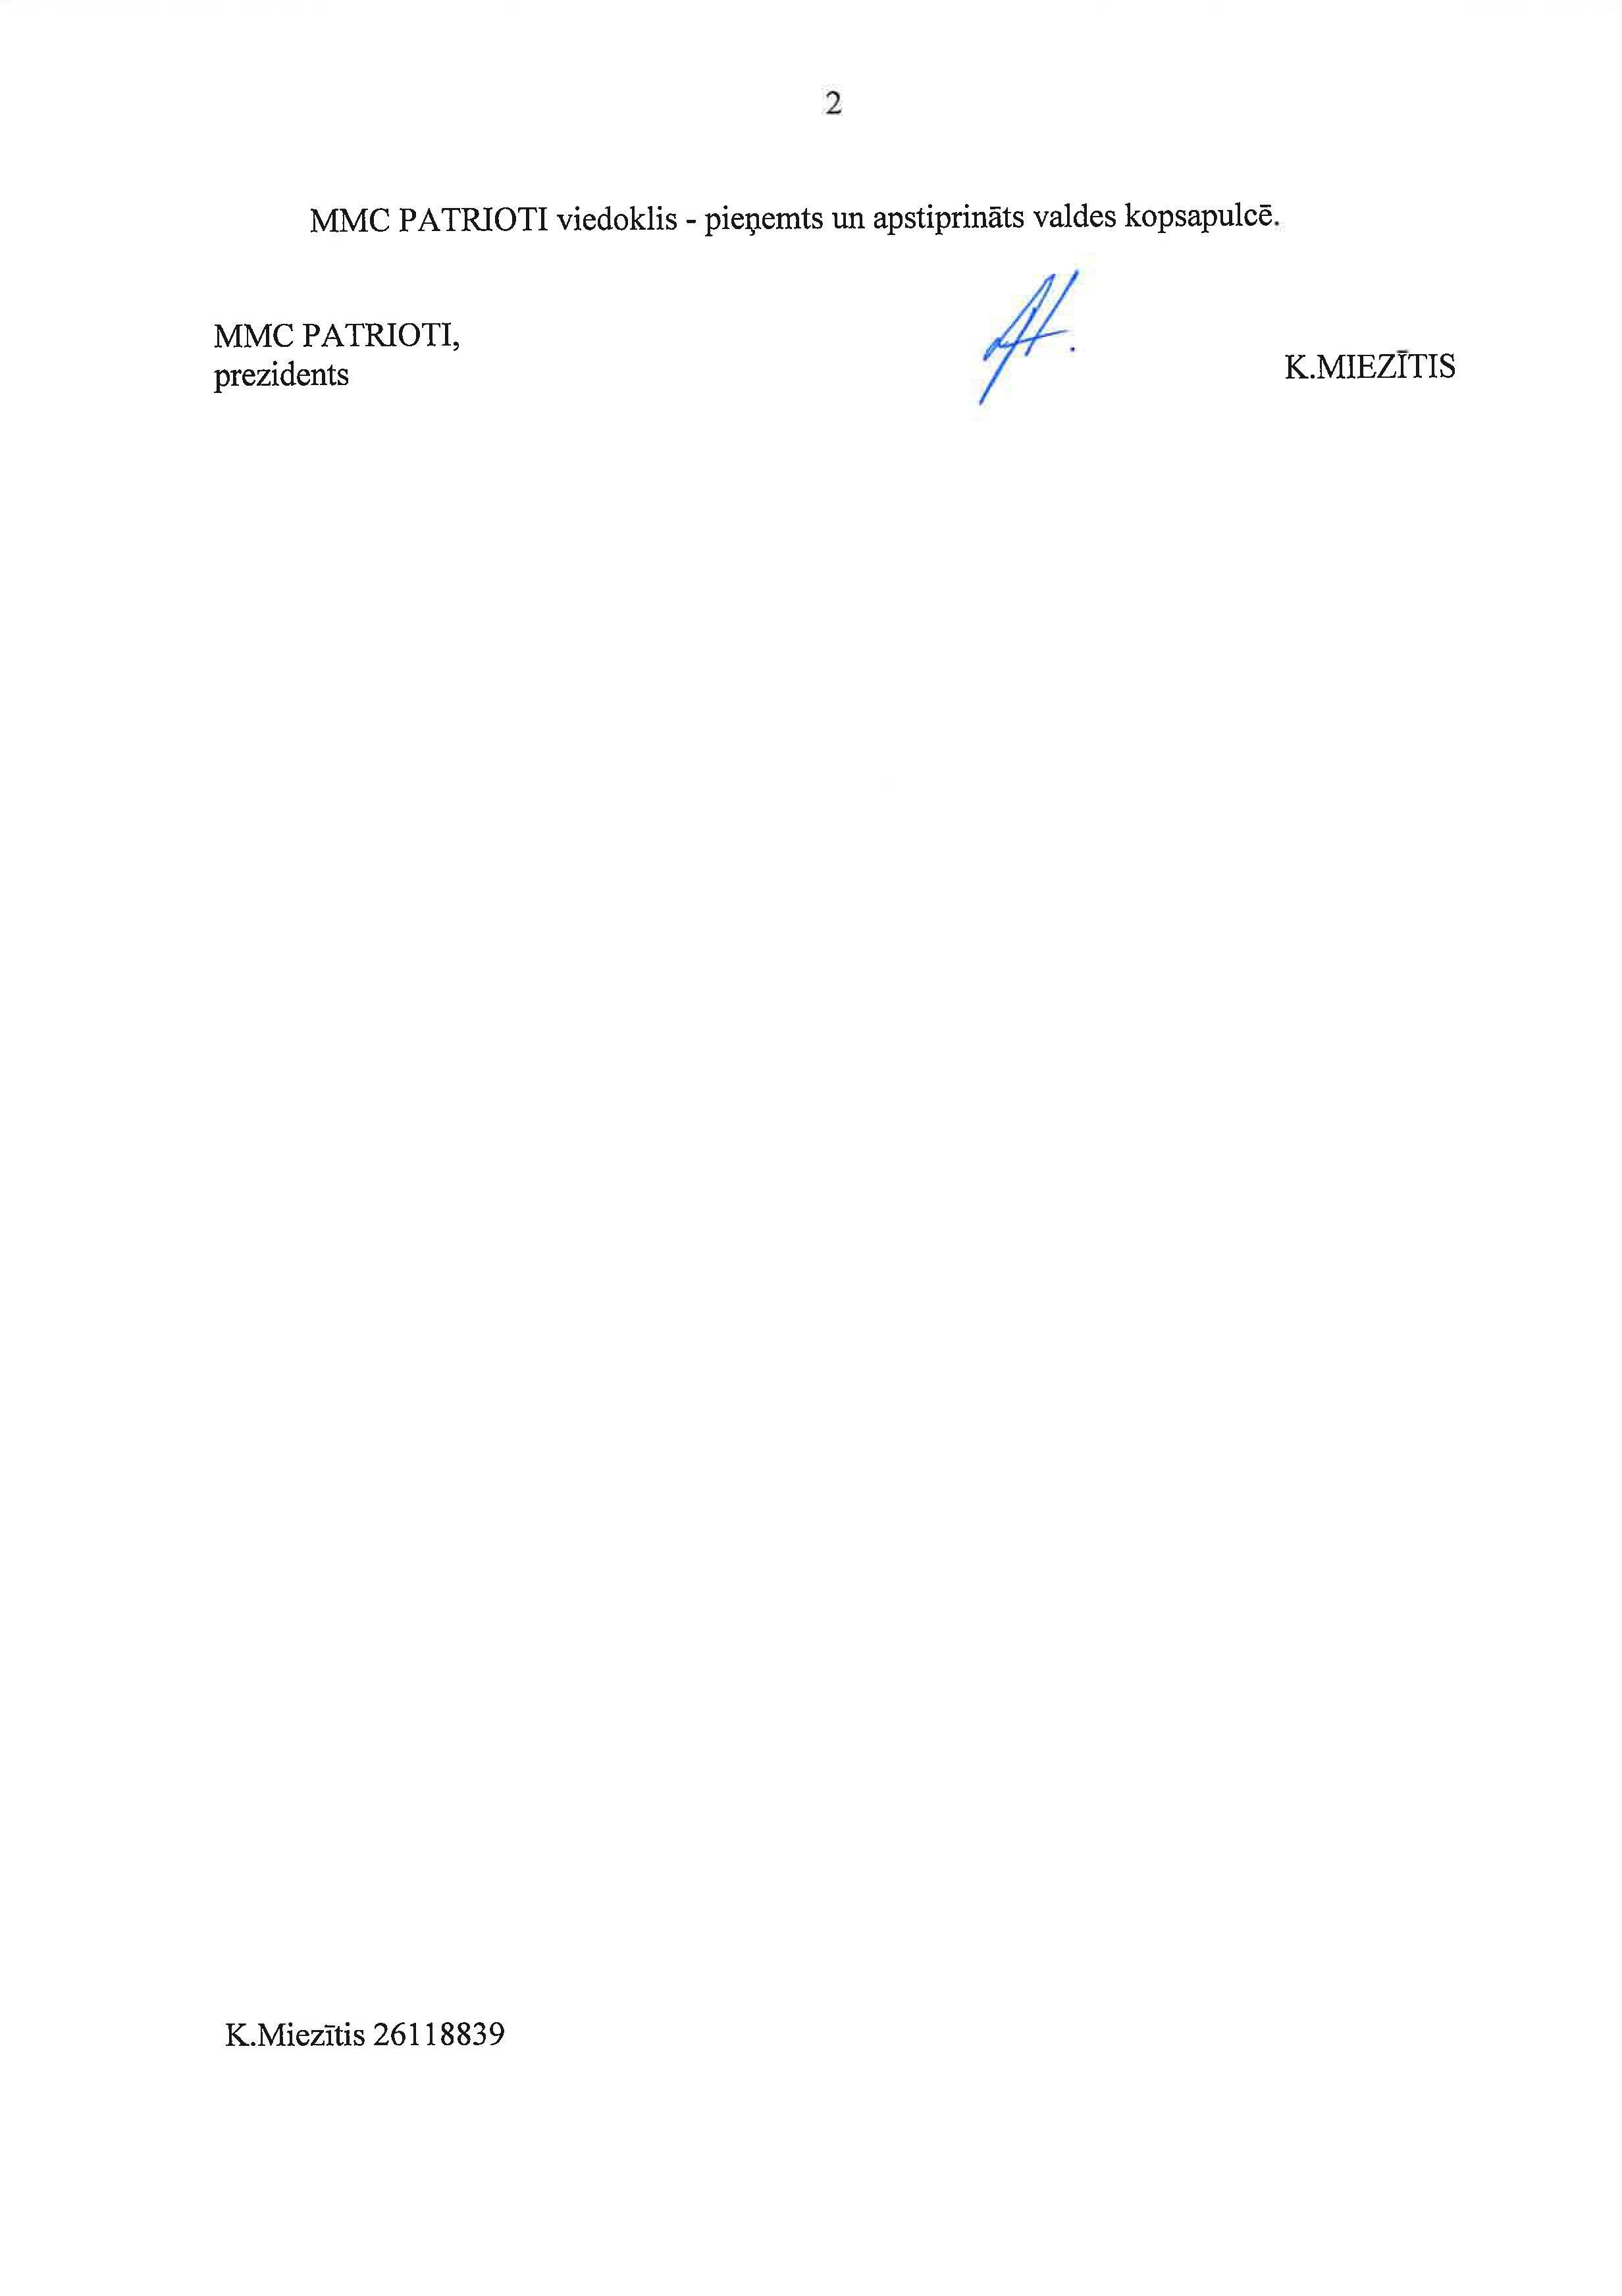 MMC PATRIOTI vestule 12.03.2016._Page_2